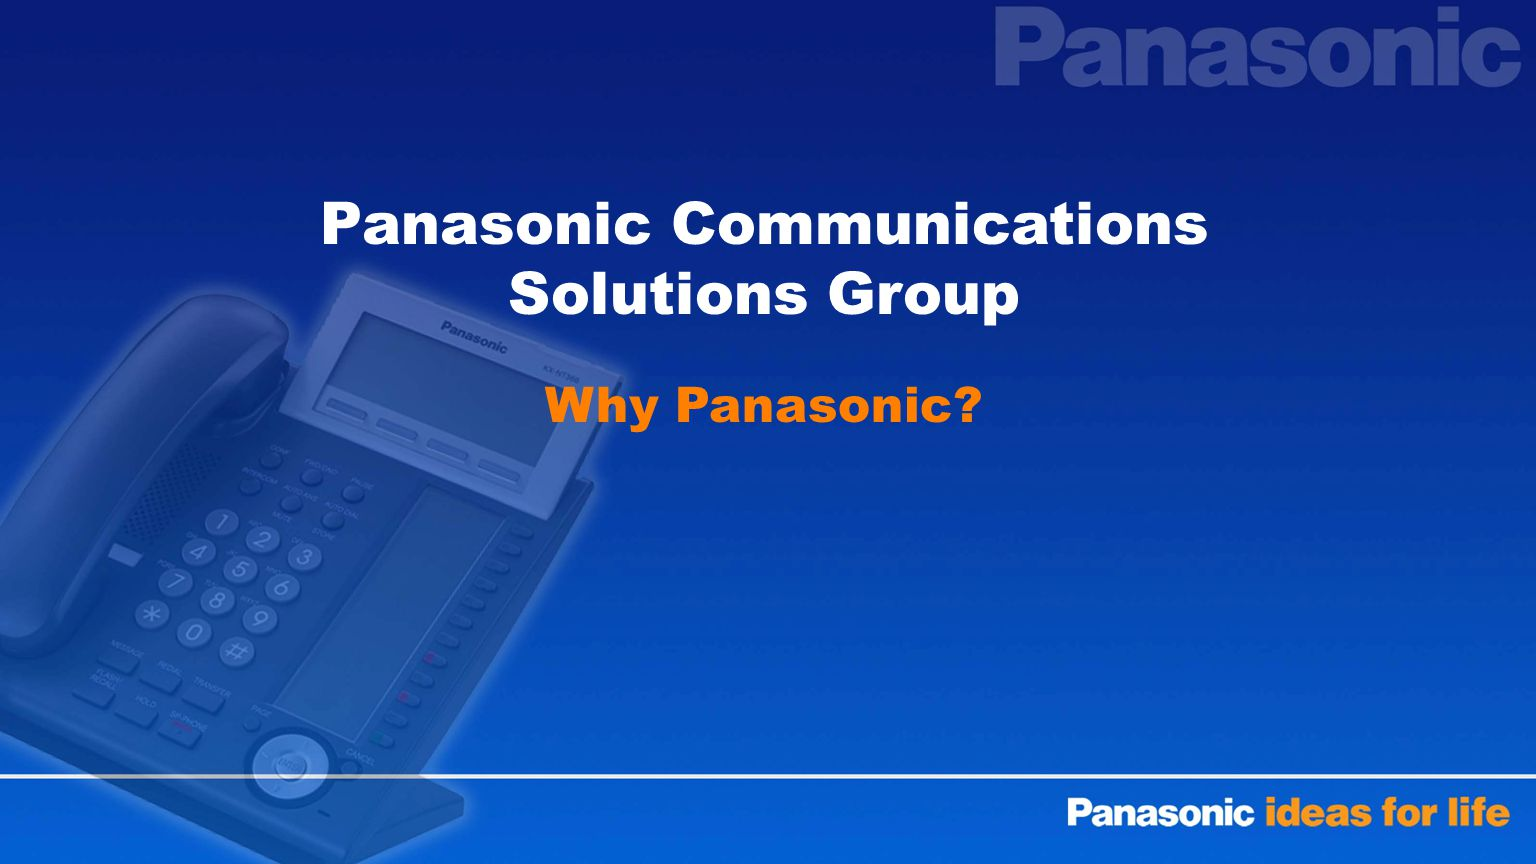 22 Panasonic – NetCam Transition (PTZ Commercial) 200820072006 PTZ E481A: $1499 PoE M580A: $999 SD Card 21x Zoom M581A: $1399 PoE 21x zoom SD Card $1299 $1249 M381A: $1499 2 Way Audio 21x zoom SD Card